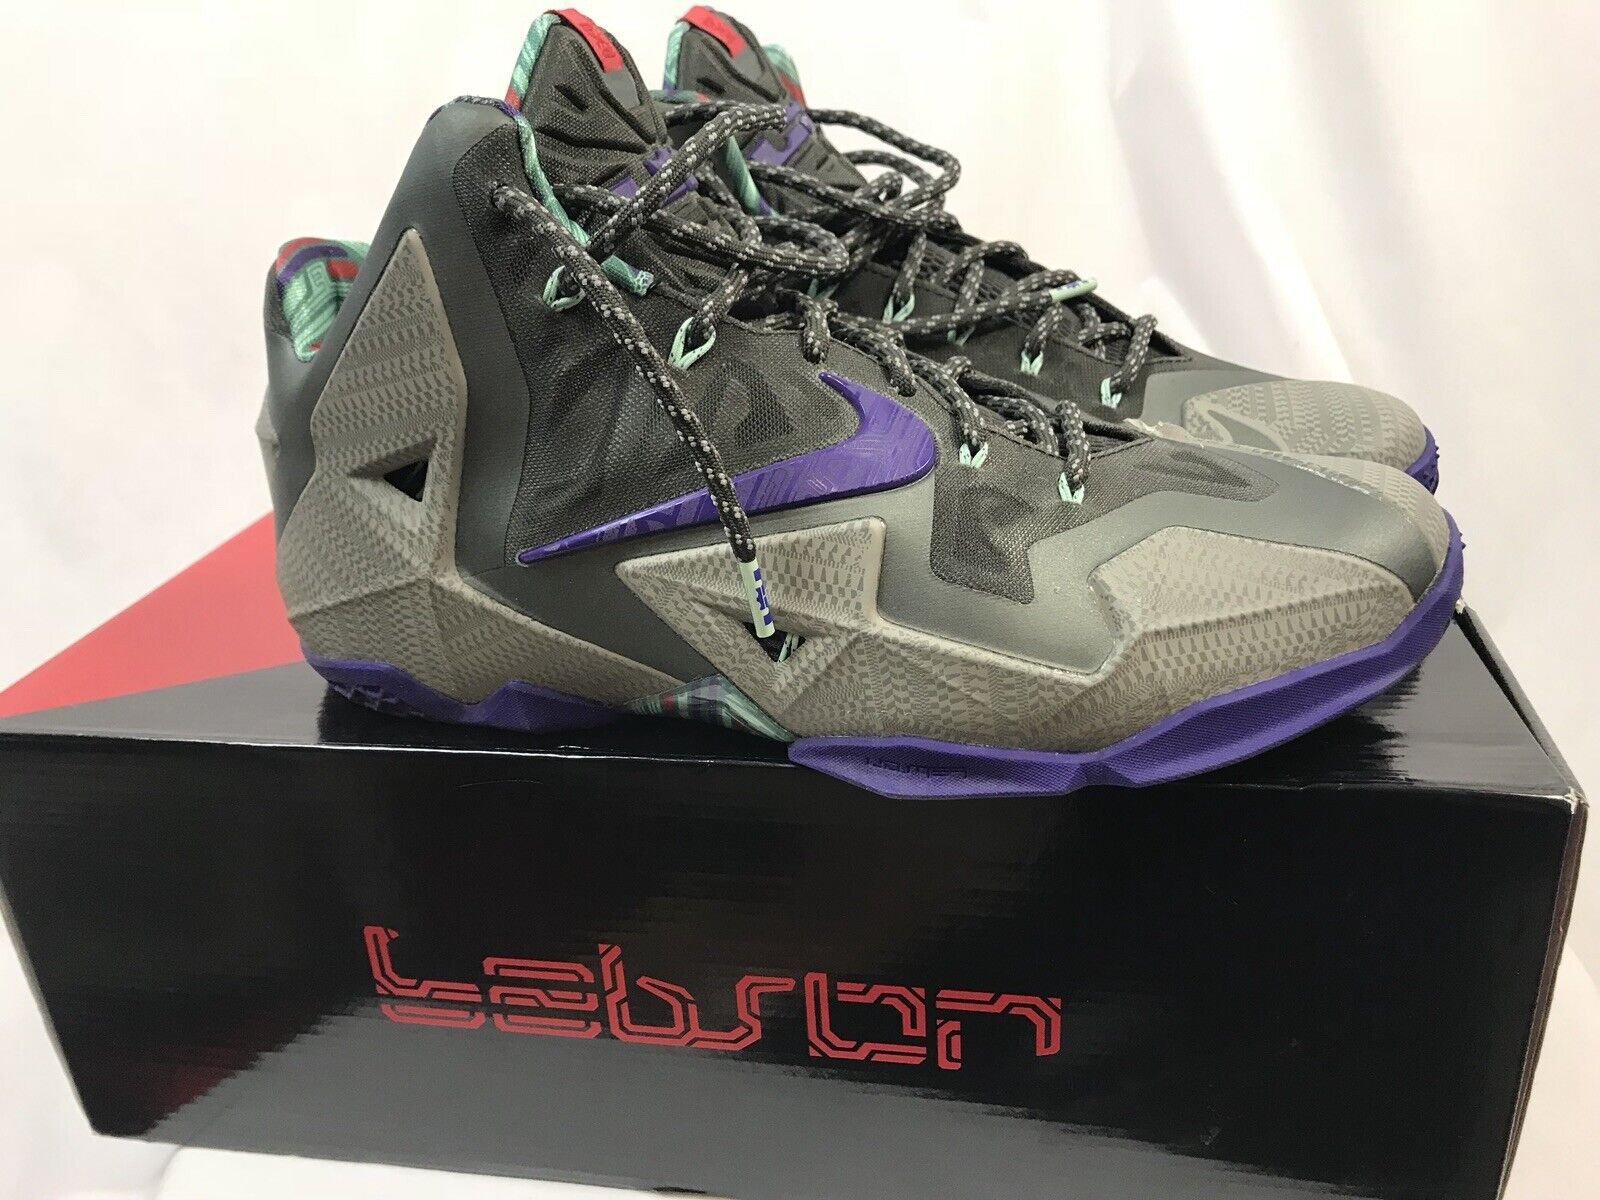 Nike Lebron Xi Scarpe da Basket, Grigio, Viola Elettrico, Uomo Taglia 11